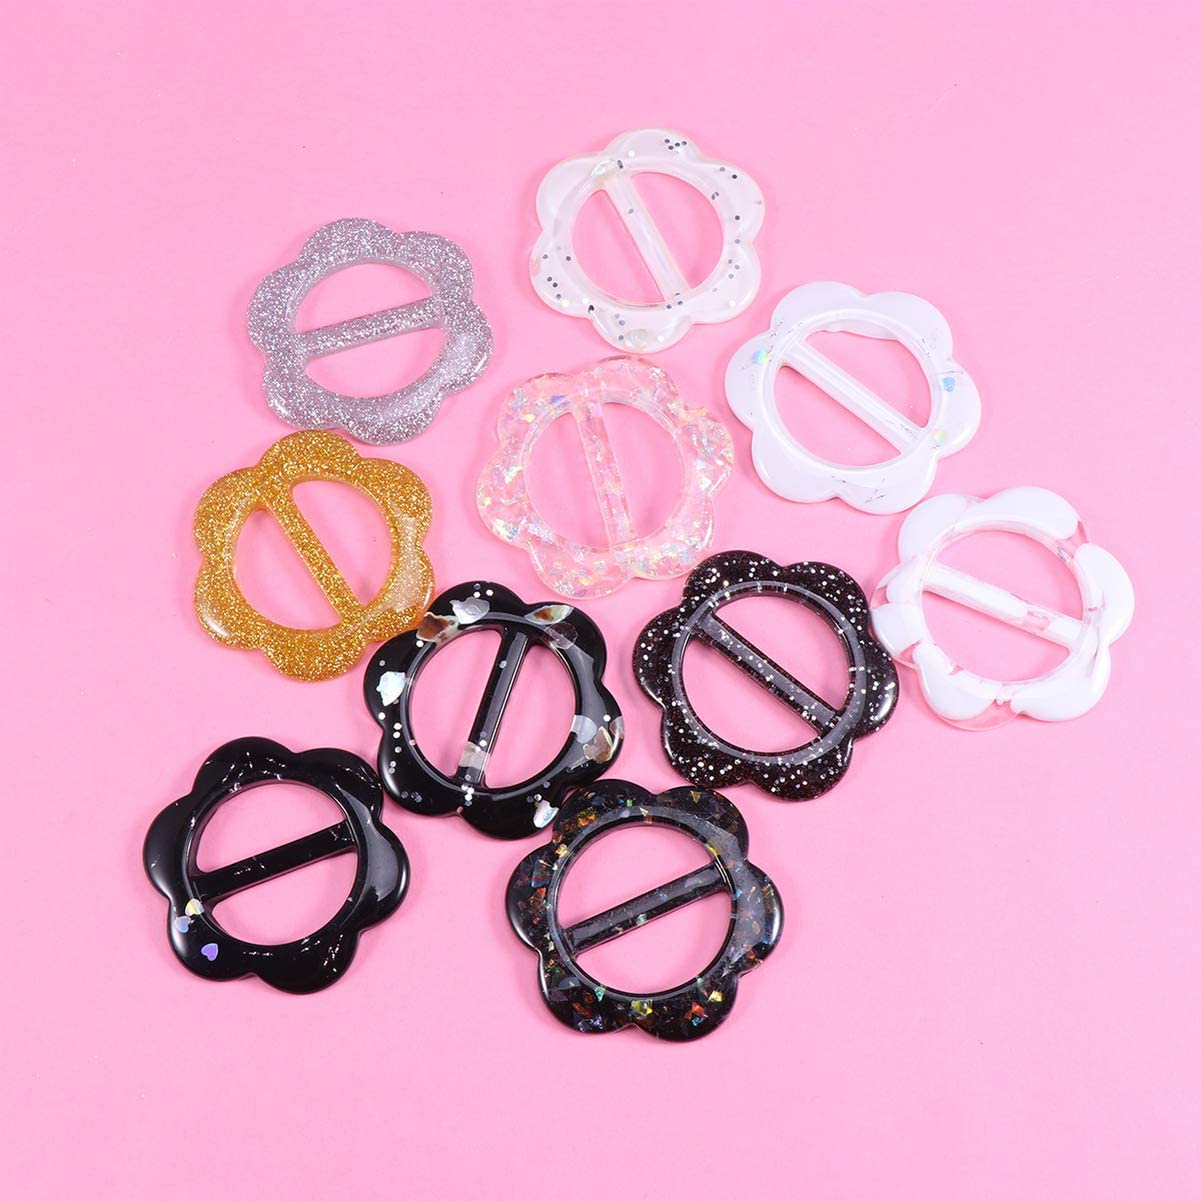 Artibetter 10pcs Tee Shirt Clips Flower Shape Clothing Ring Wrap Holder For Women Girls Neckerchief Clothing T-Shirt